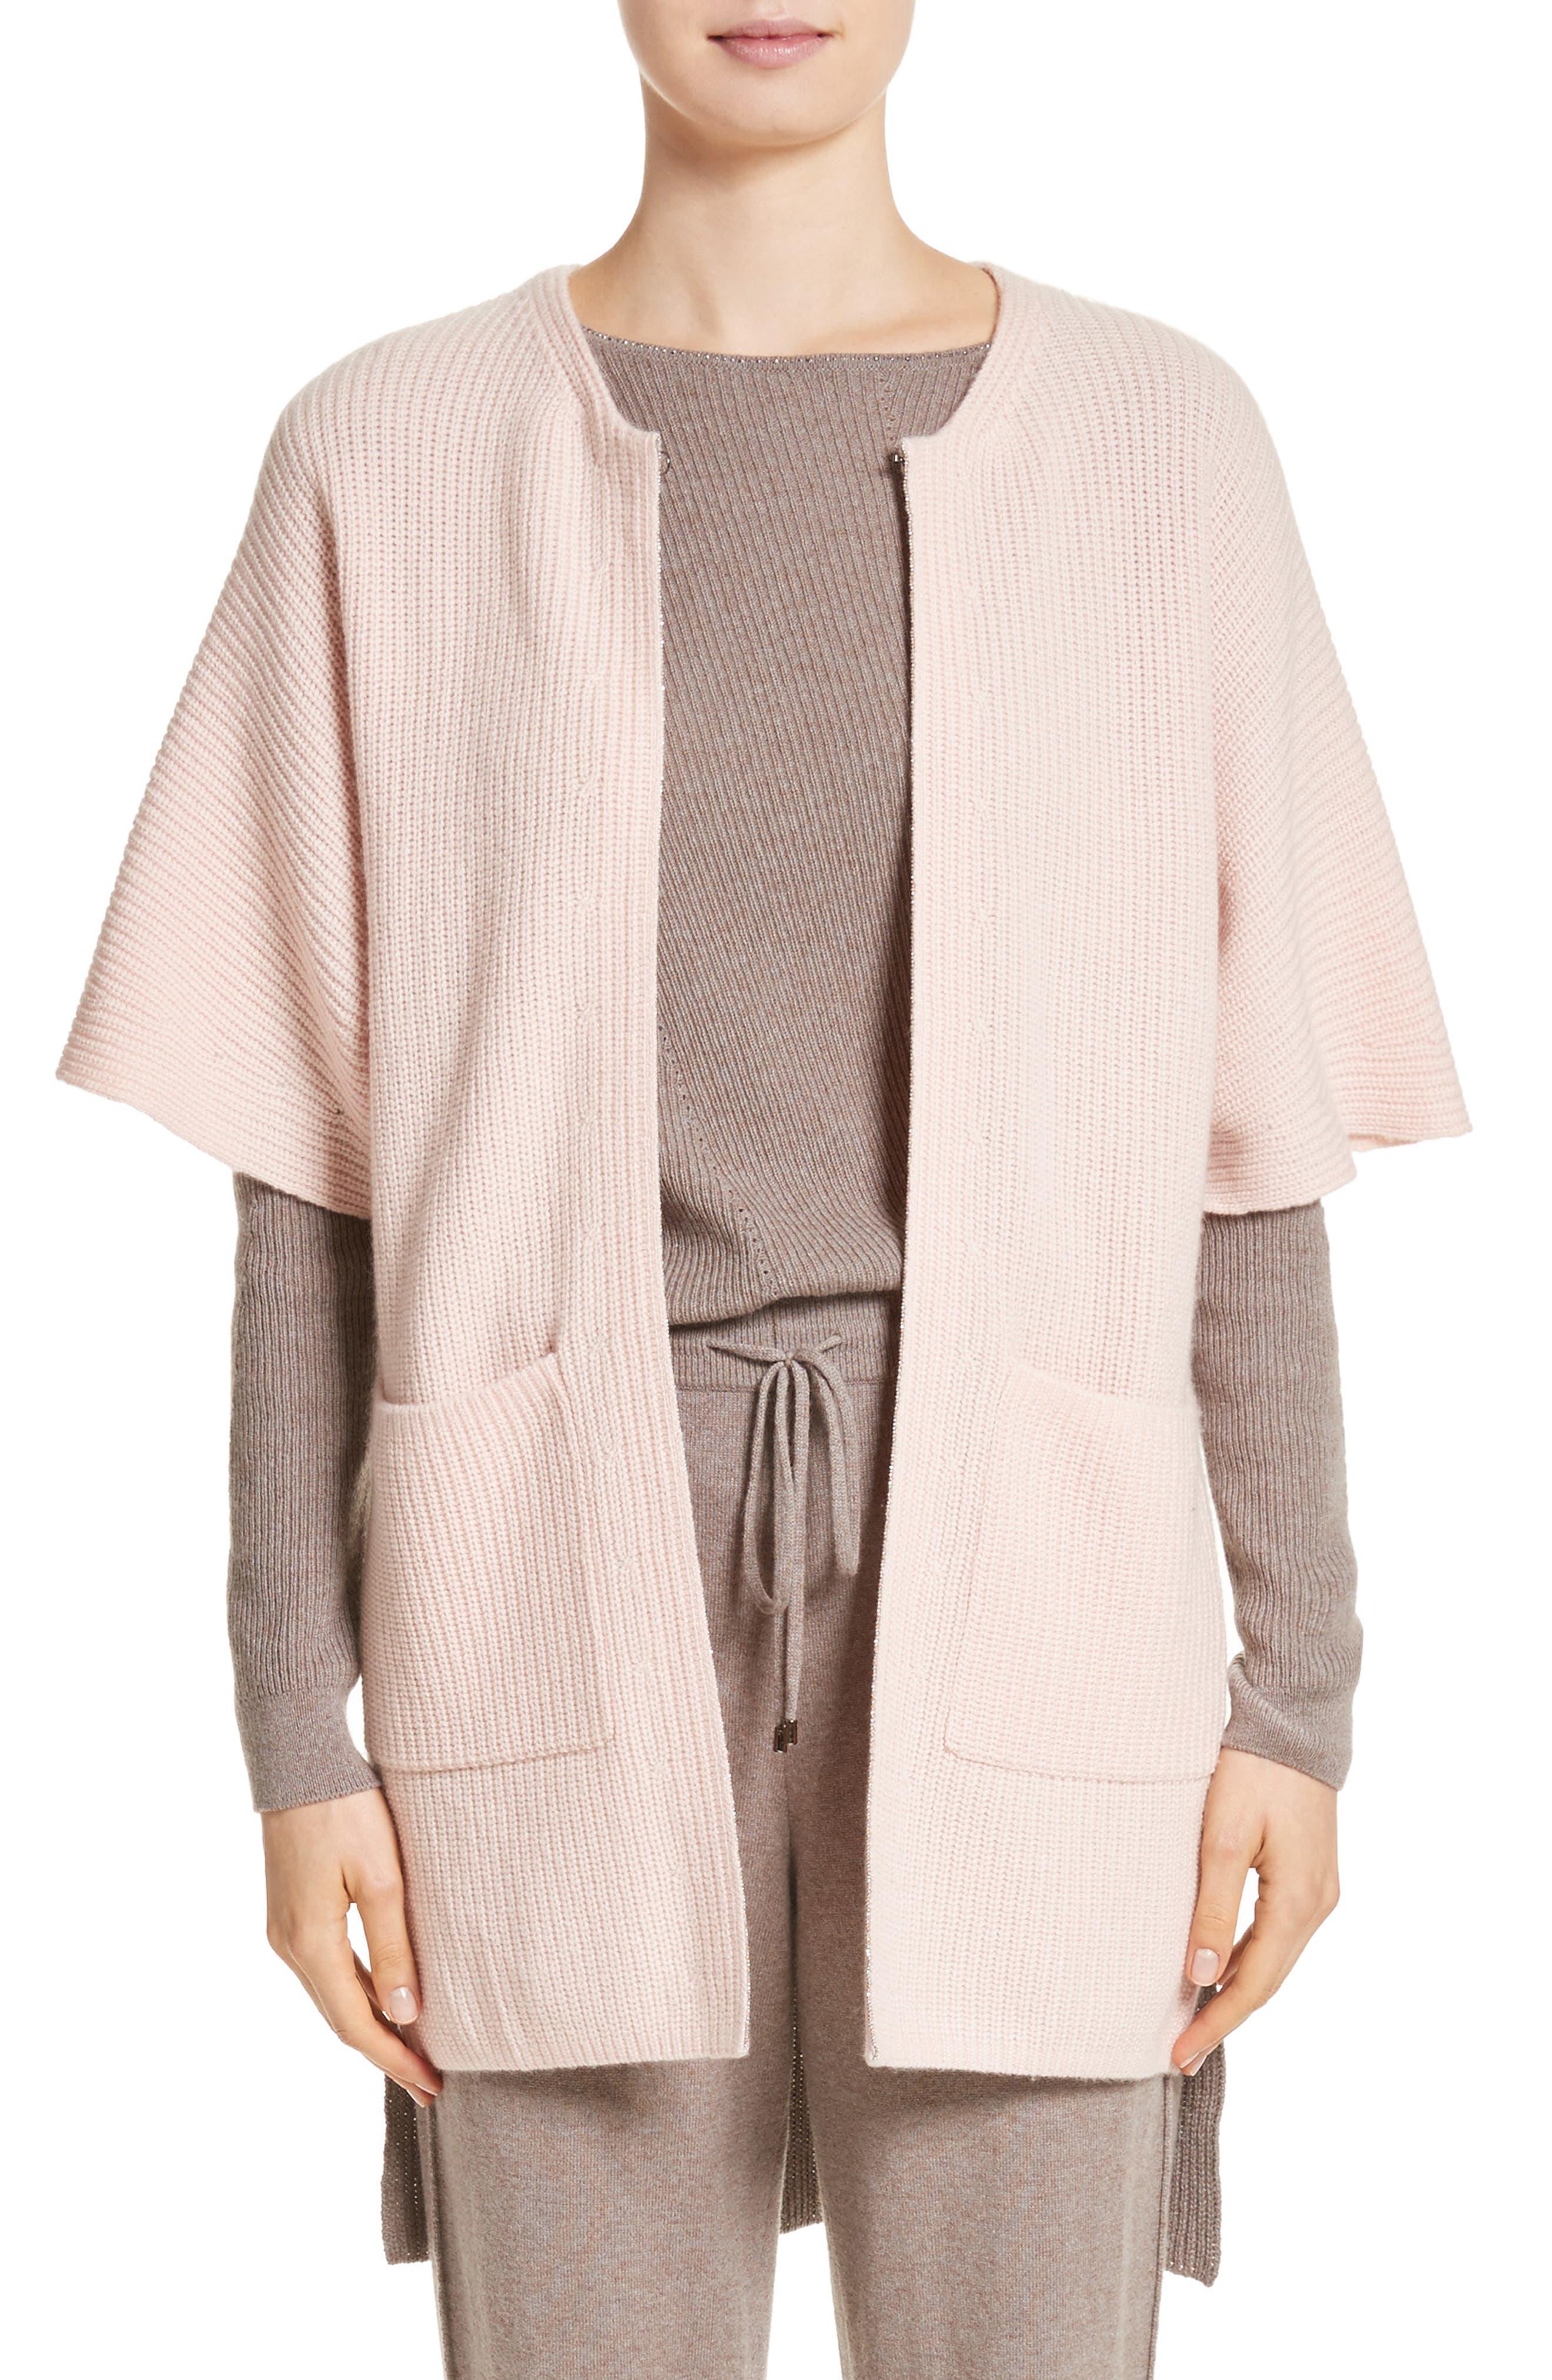 Patch Pocket Cashmere Cardigan,                         Main,                         color, Blush/Travertine